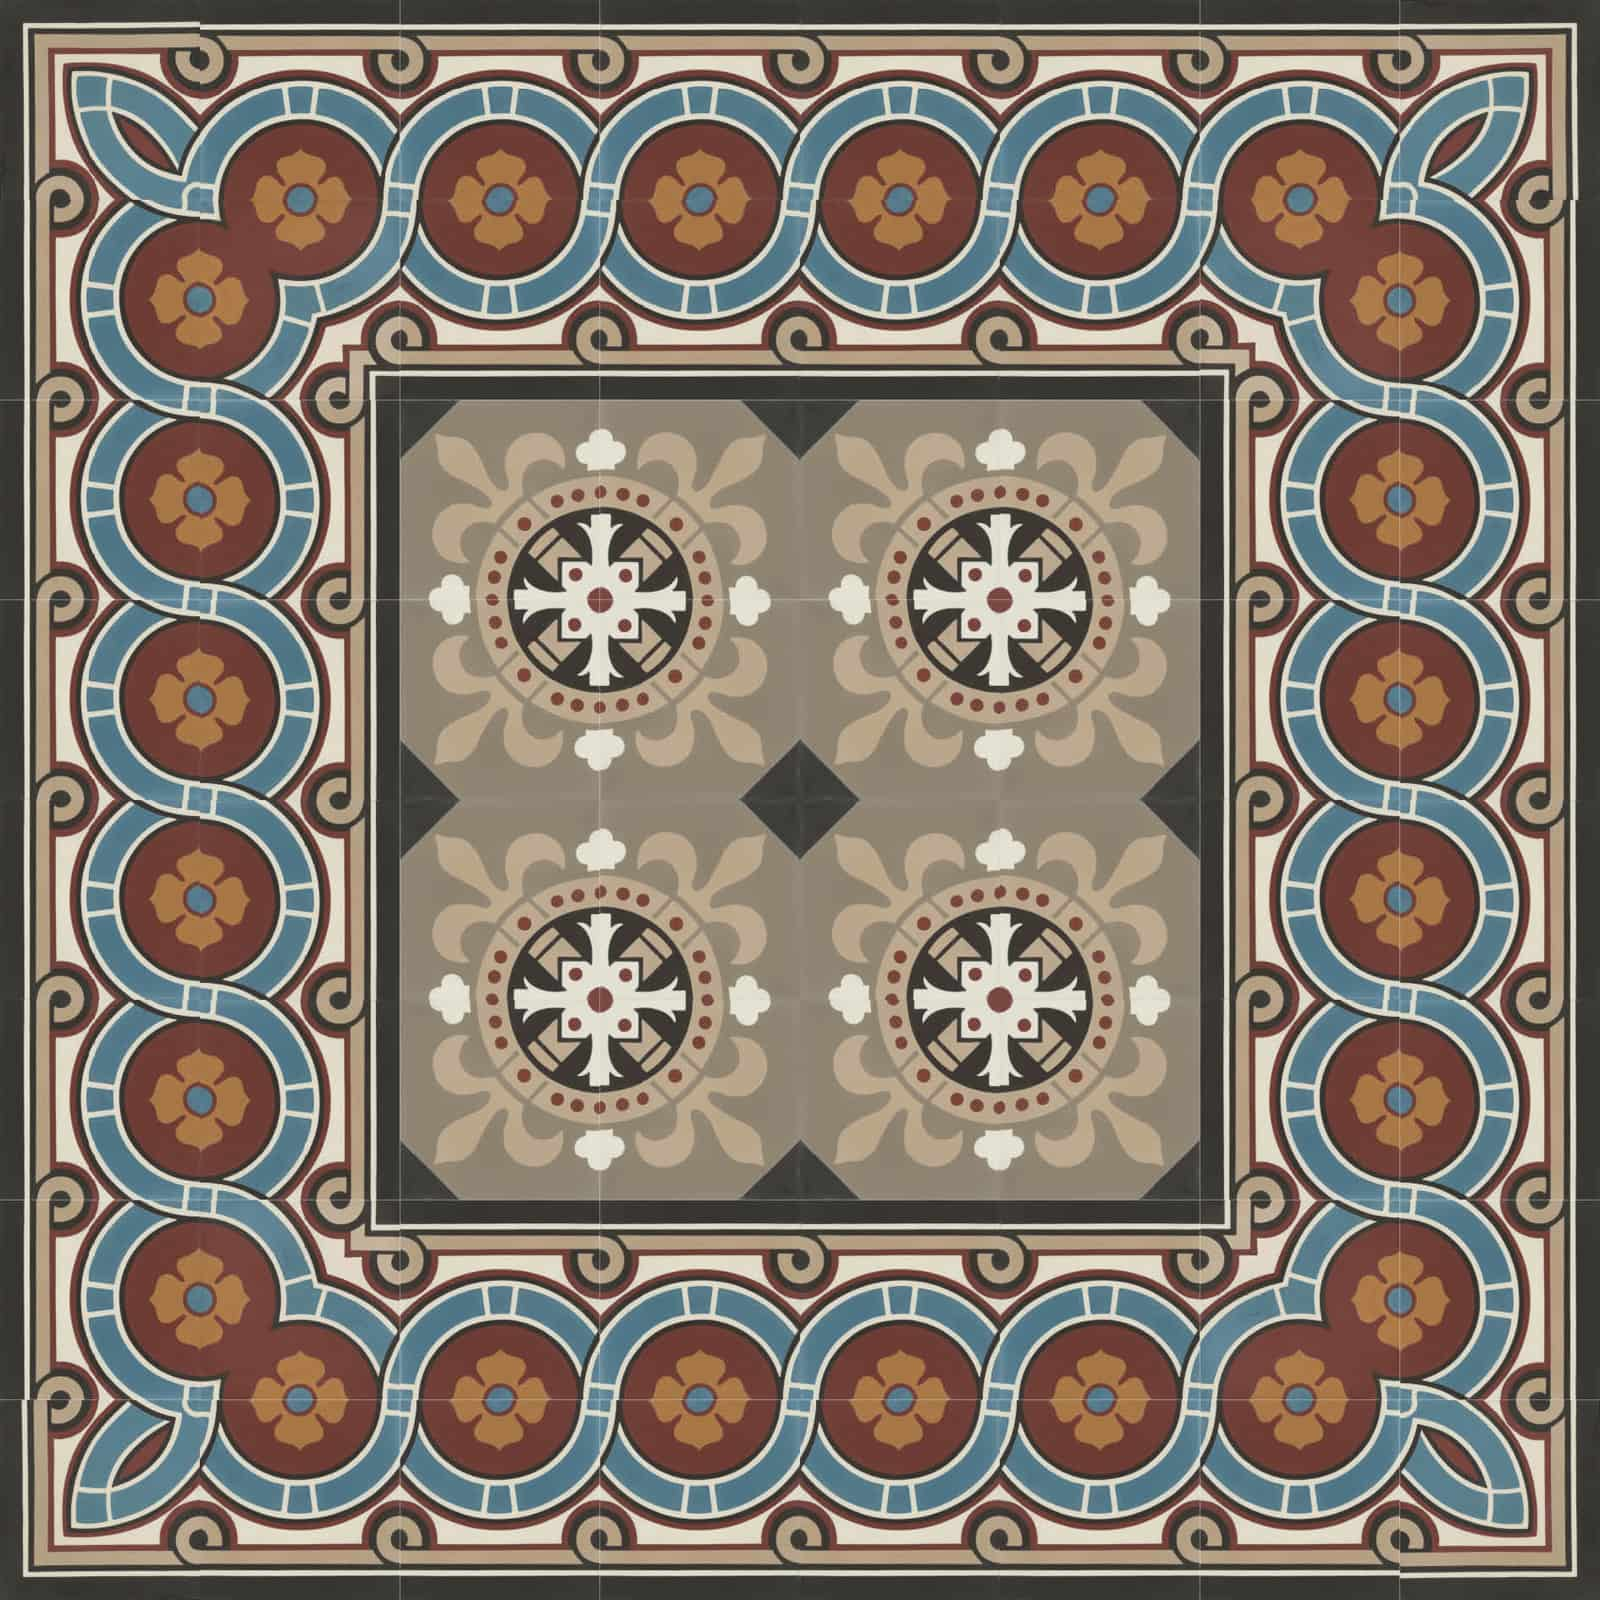 zementfliesen-verlegemuster-nummer-51166-170-viaplatten | N° 51166/170